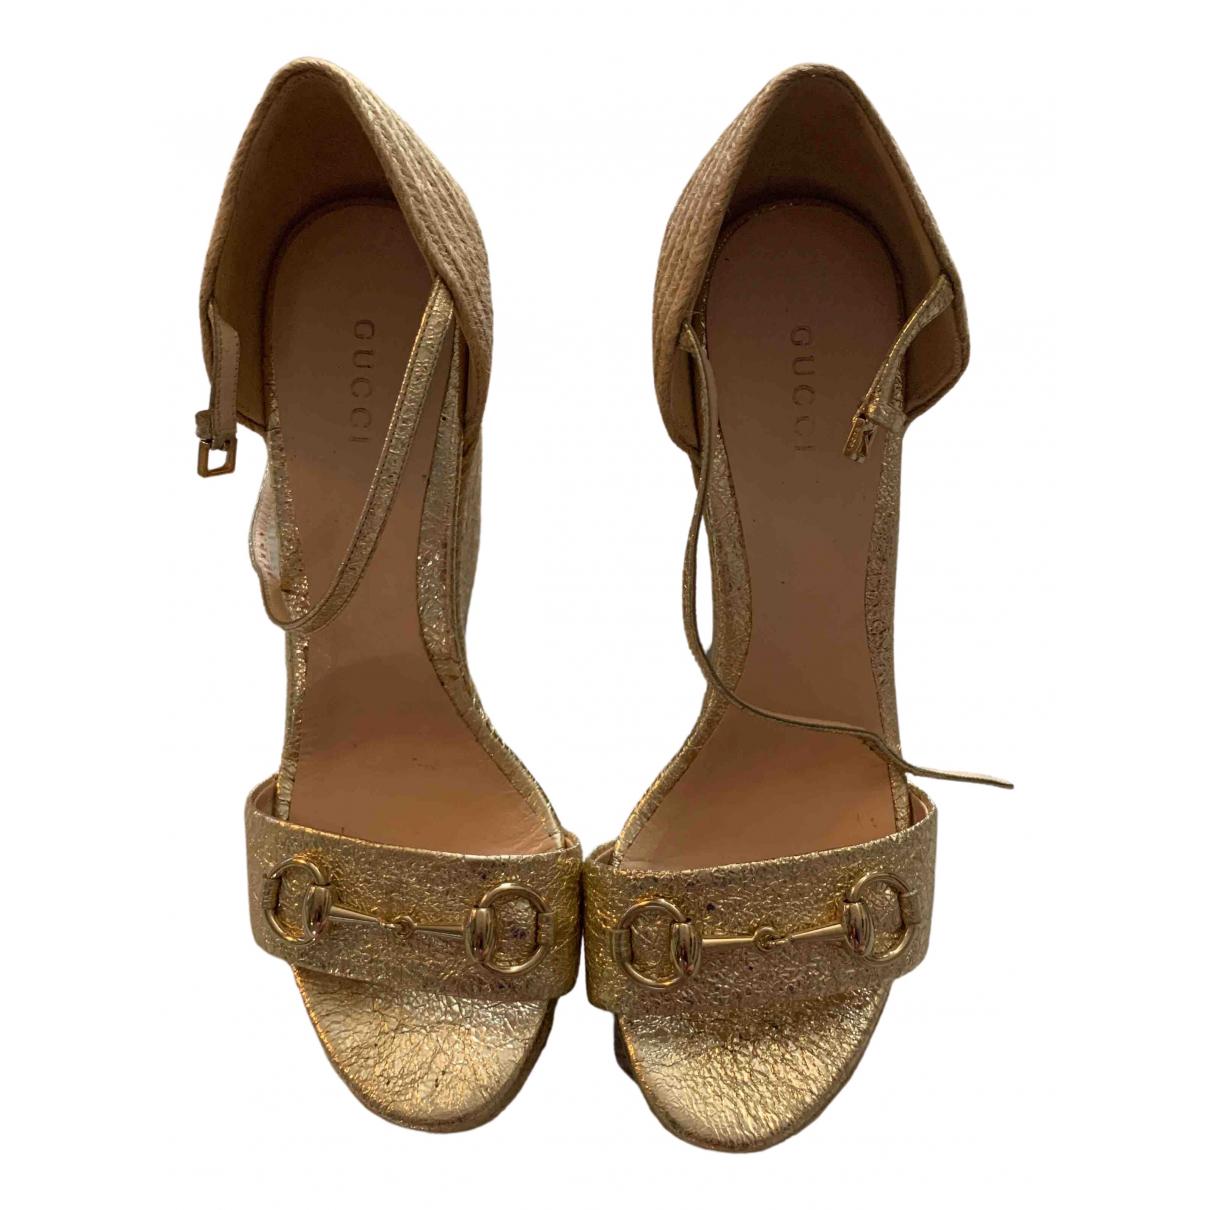 Gucci \N Metallic Cloth Sandals for Women 38.5 IT